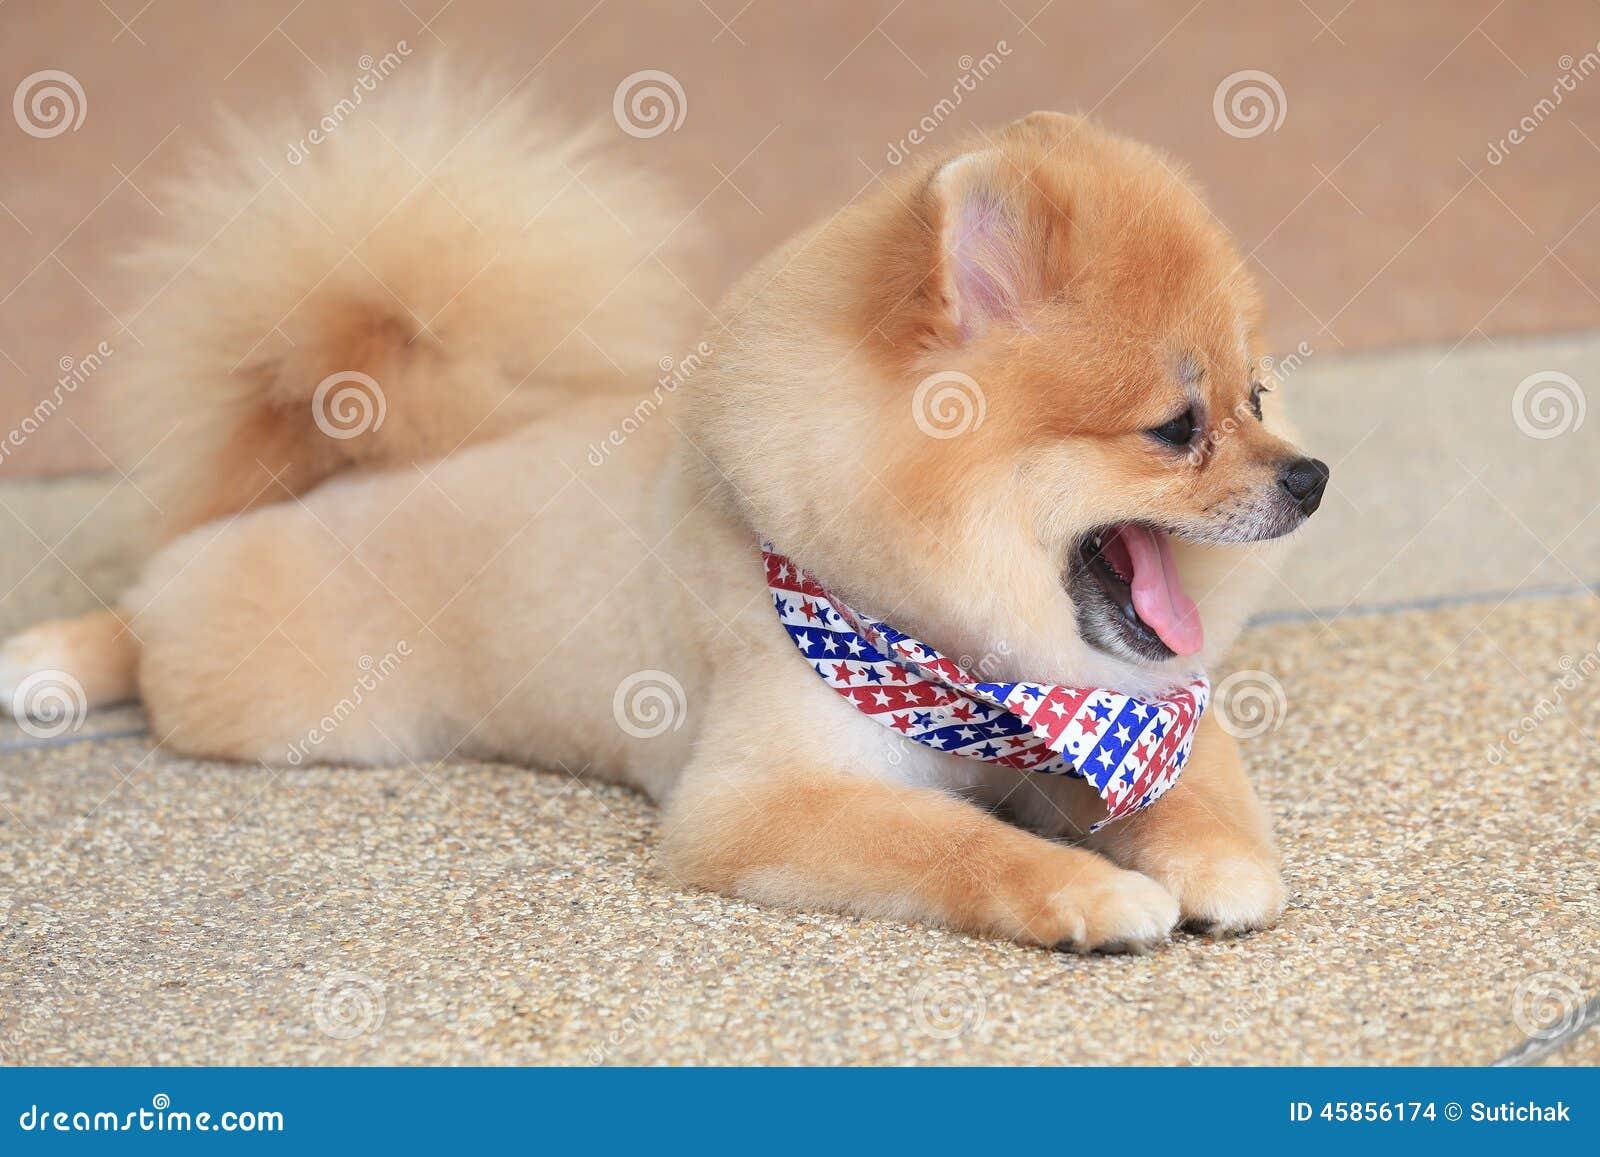 Pomeranian Dog Puppy Cute Pet Stock Photo - Image: 45856174